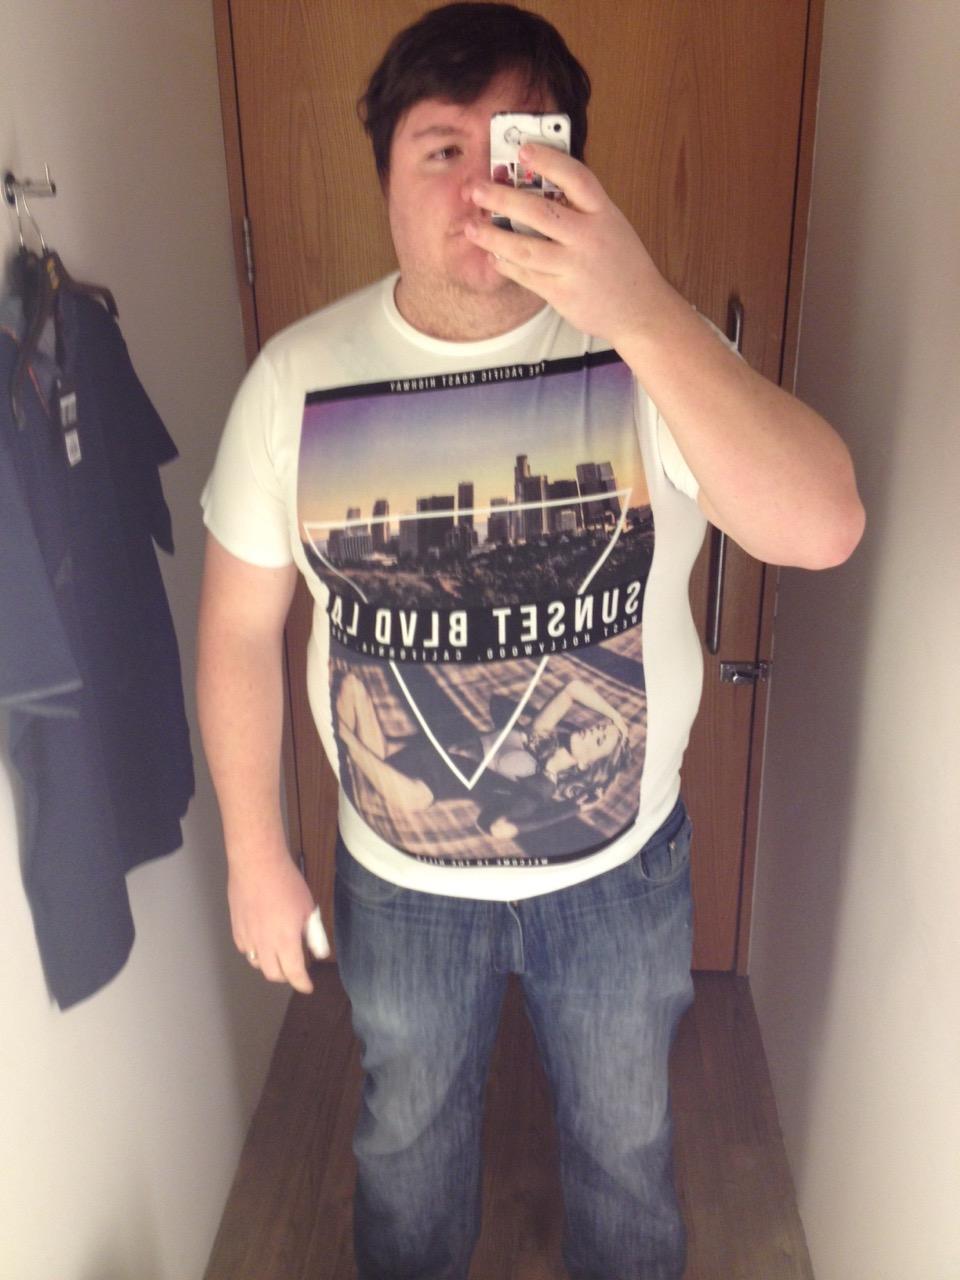 Leg day t shirts men s polo shirt slim - Primark